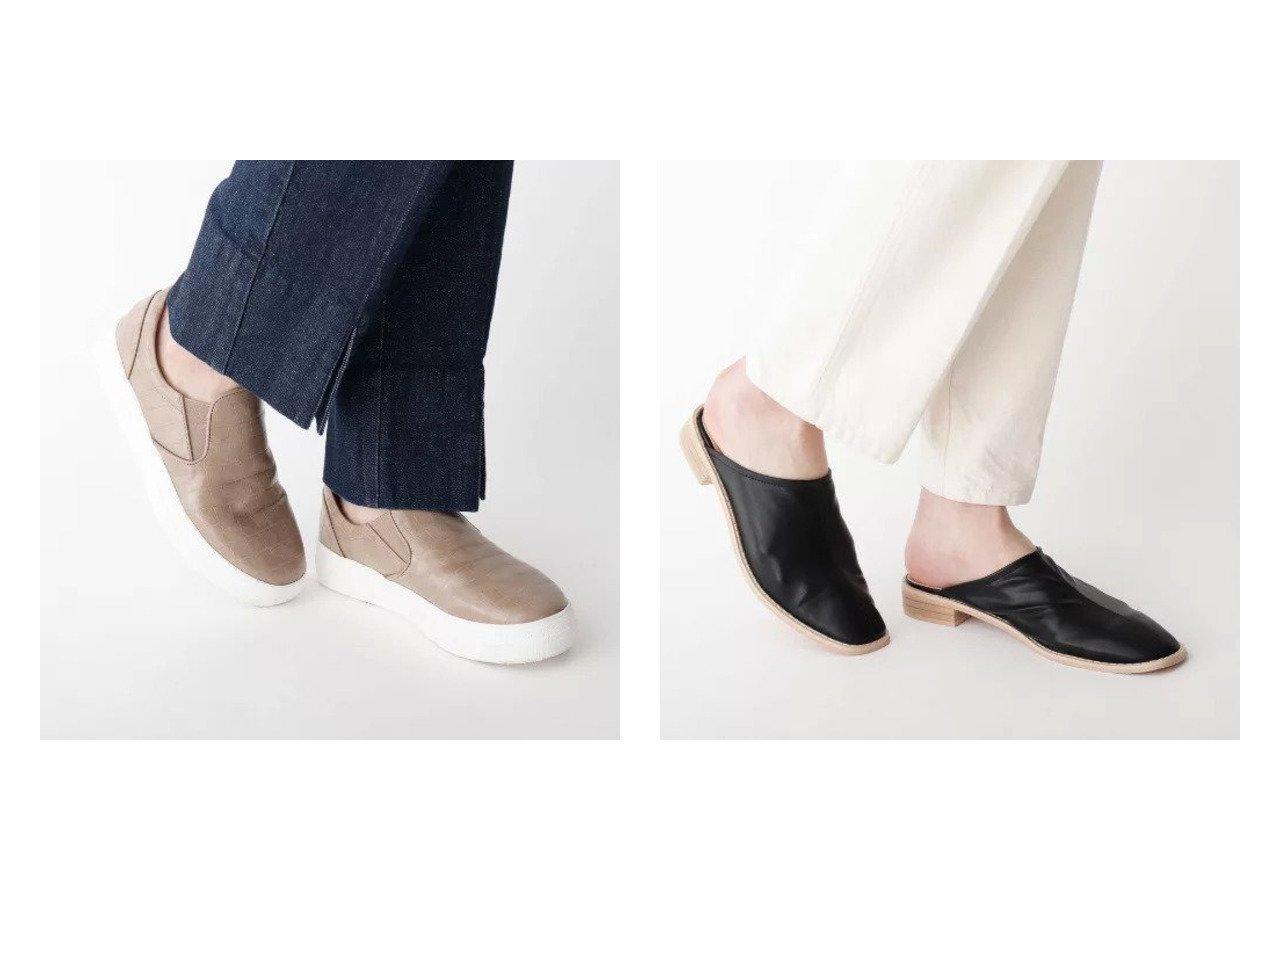 【OPAQUE.CLIP/オペークドットクリップ】のクロコ調合皮スリッポン&ソフト合皮ミュール シューズ・靴のおすすめ!人気、トレンド・レディースファッションの通販 おすすめで人気の流行・トレンド、ファッションの通販商品 メンズファッション・キッズファッション・インテリア・家具・レディースファッション・服の通販 founy(ファニー) https://founy.com/ ファッション Fashion レディースファッション WOMEN クロコ シューズ シンプル ジャージ スニーカー スリッポン サンダル スリッパ ミュール |ID:crp329100000023352